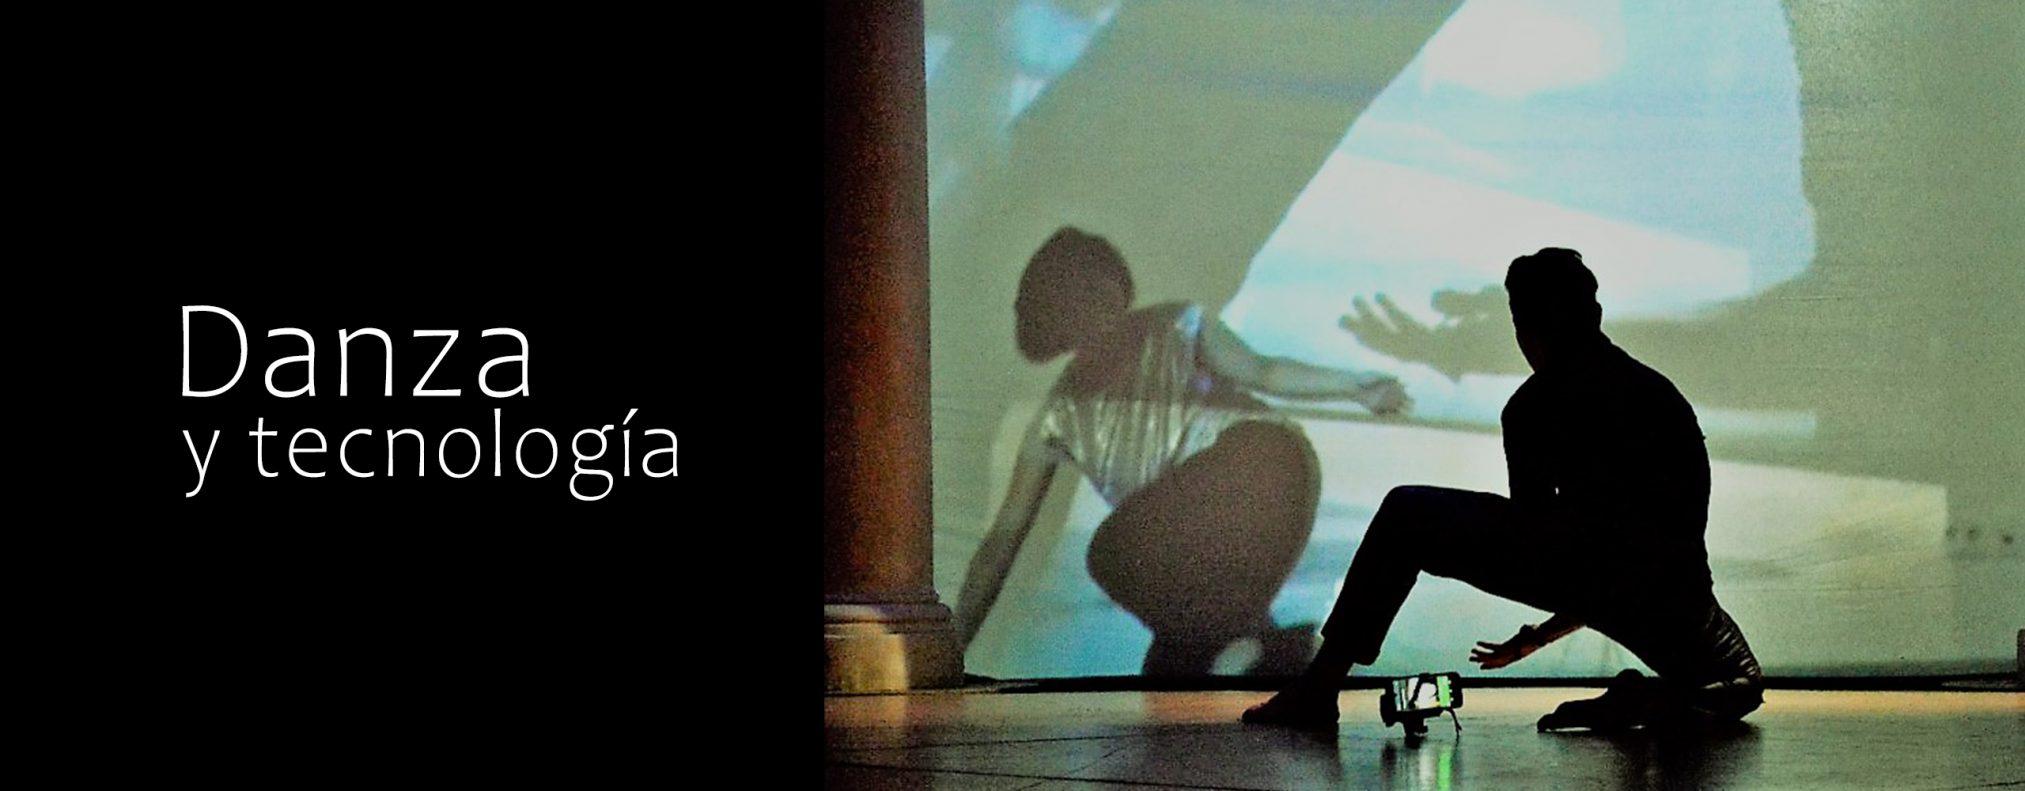 danzaytecnologia